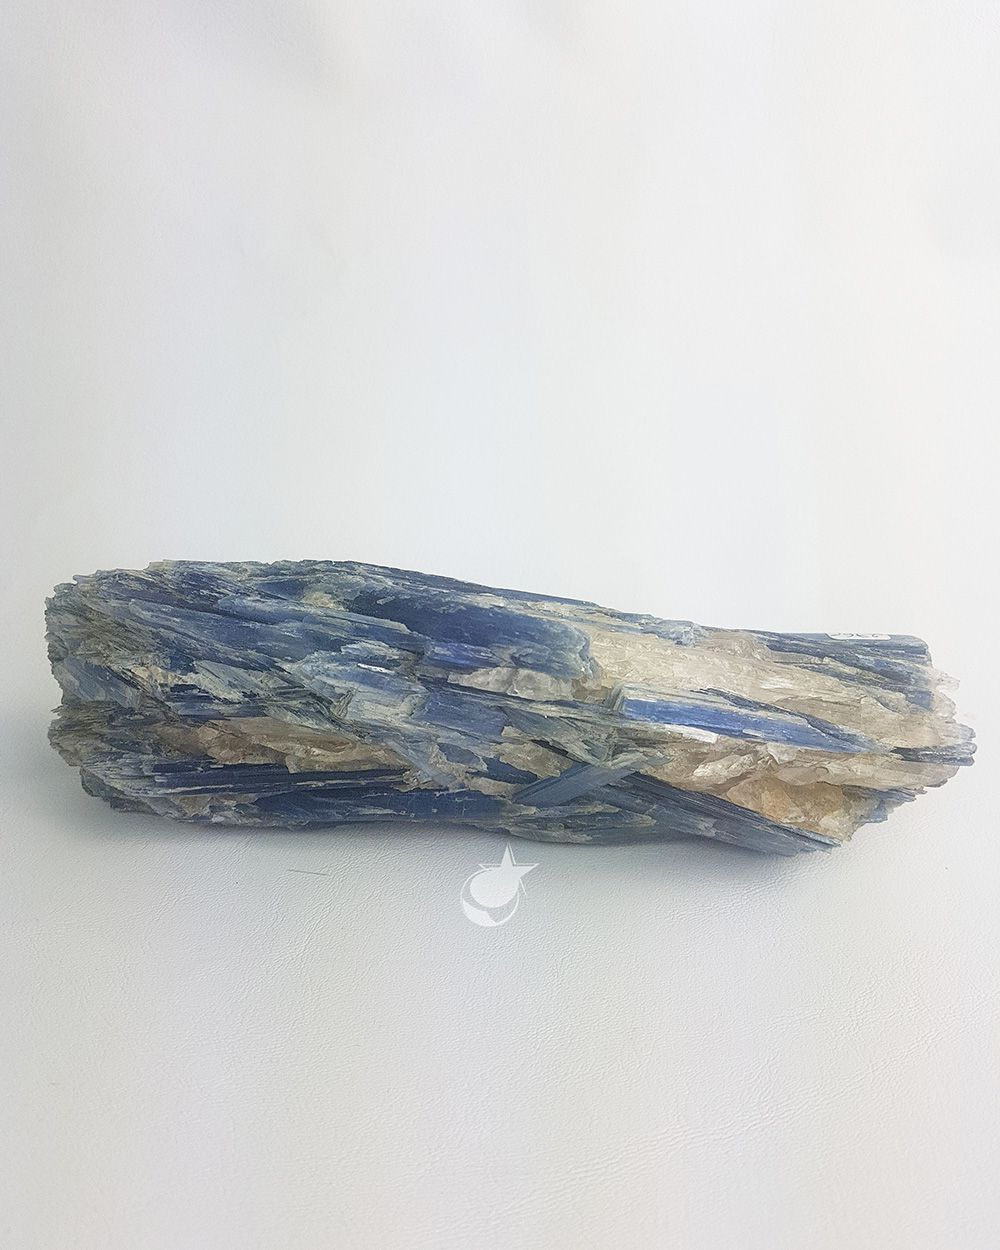 CIANITA AZUL BRUTA - 20 cm